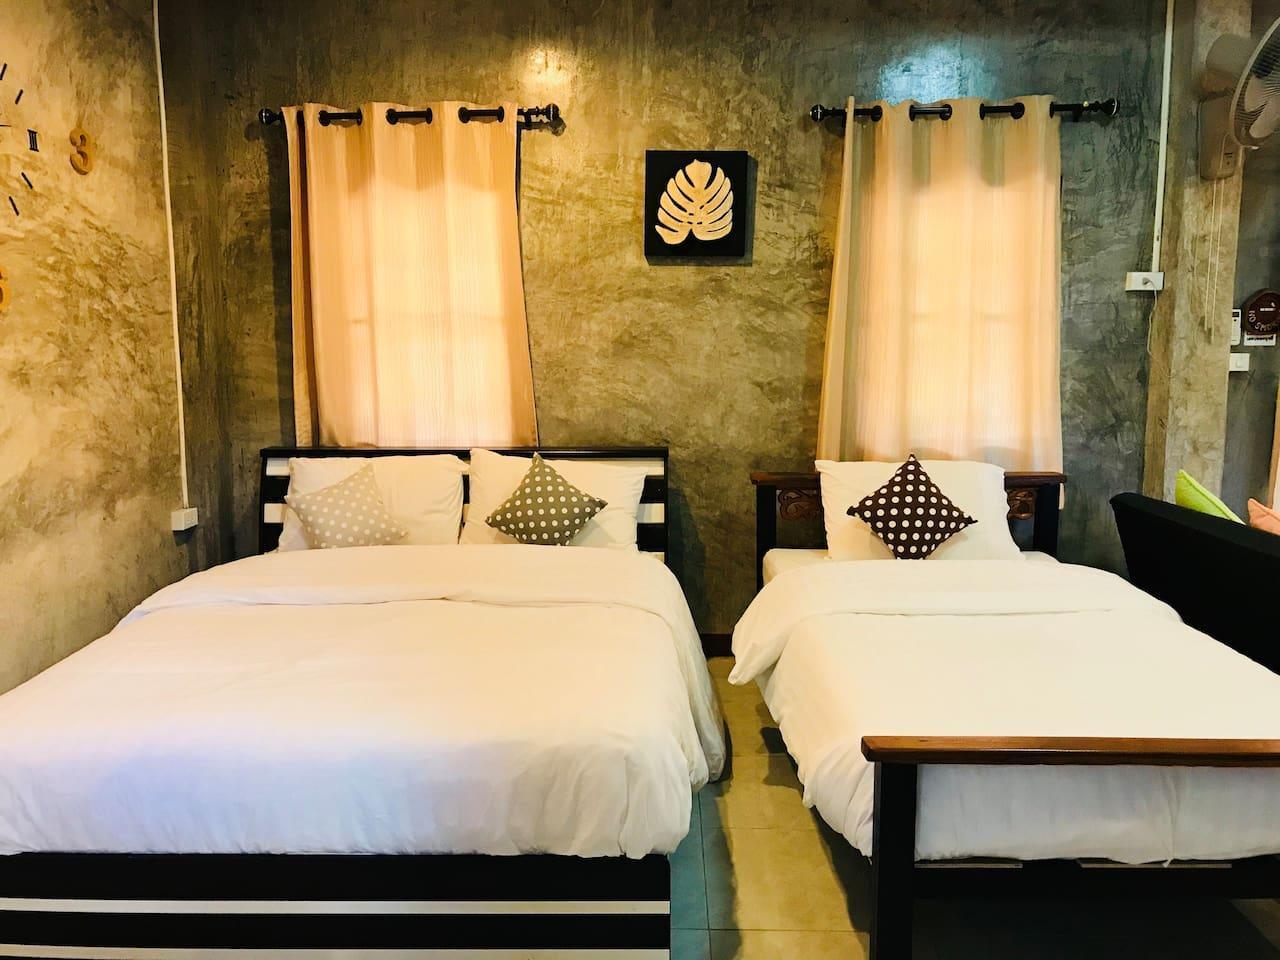 Plern Malee Private Suite, for 3 people 1 ห้องนอน 1 ห้องน้ำส่วนตัว ขนาด 50 ตร.ม. – ดอยอินทนนท์